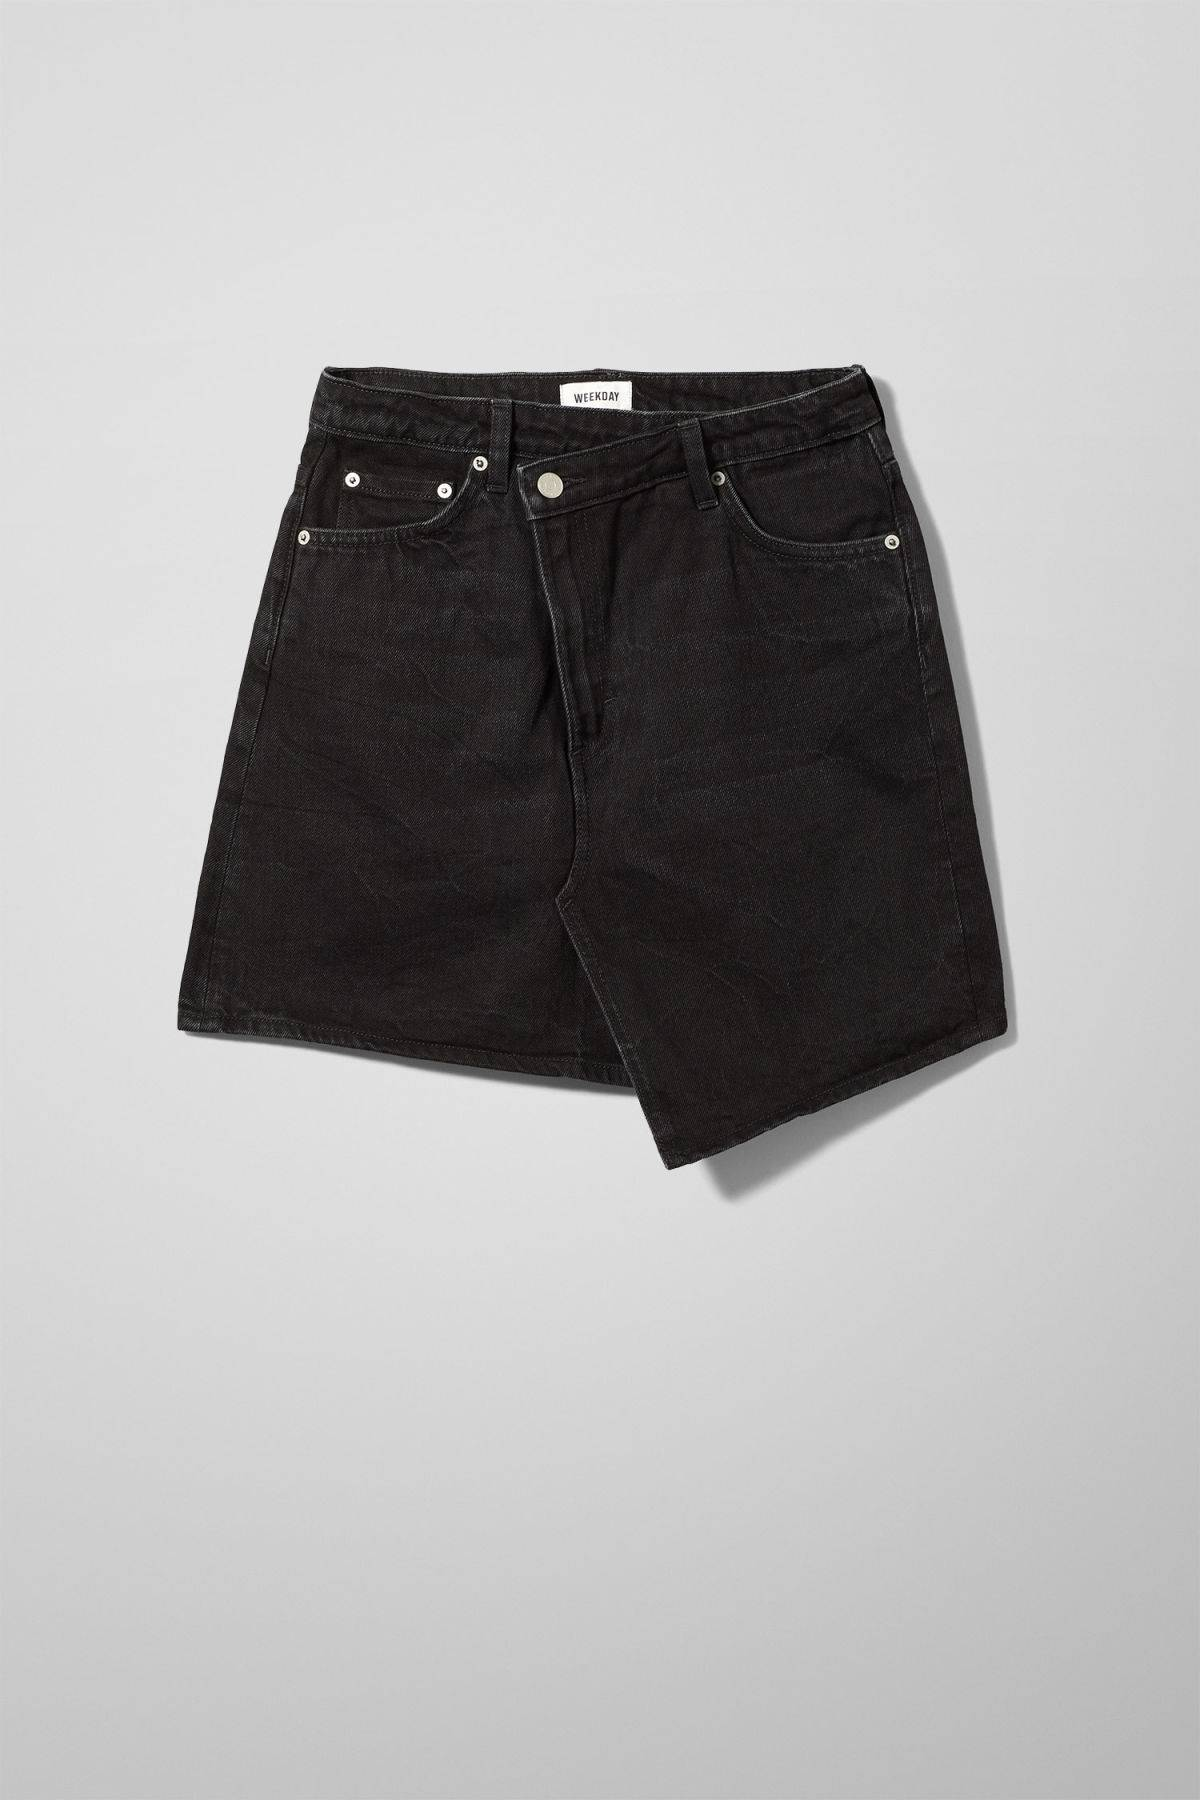 Newa Denim Skirt - Black